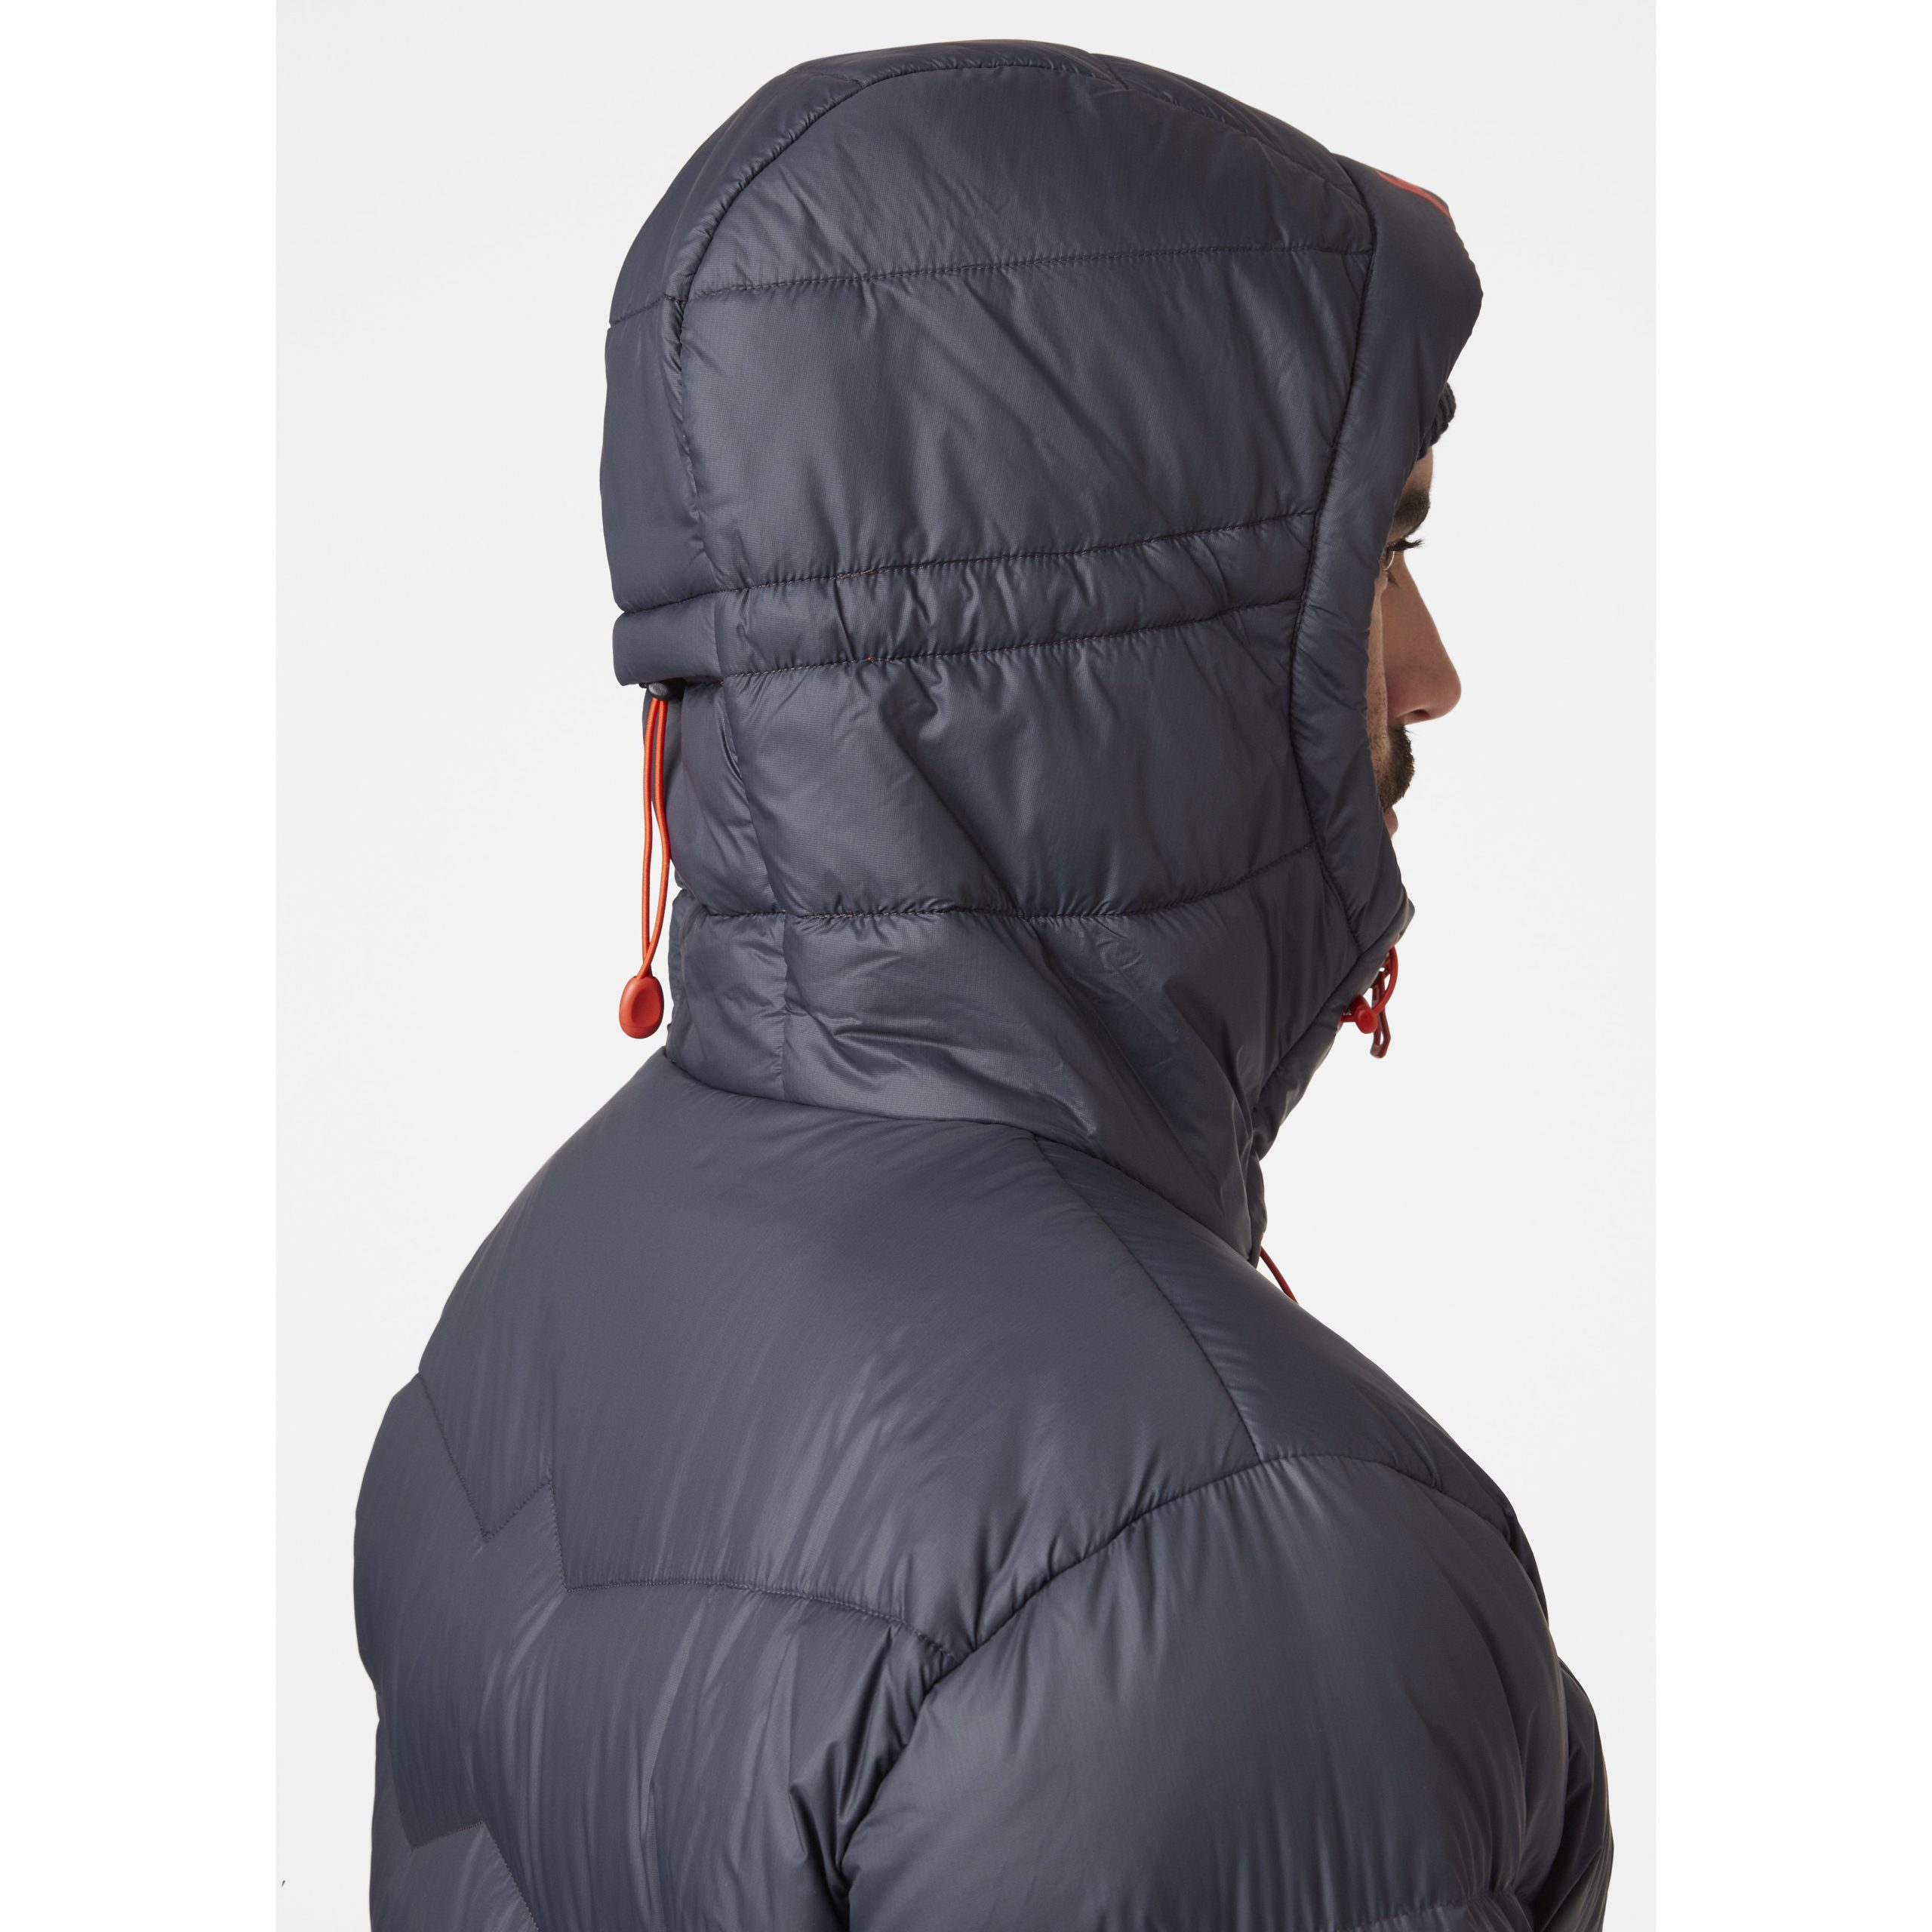 L Hombre Black Helly Hansen Verglas Icefall Down Jacket Chaqueta